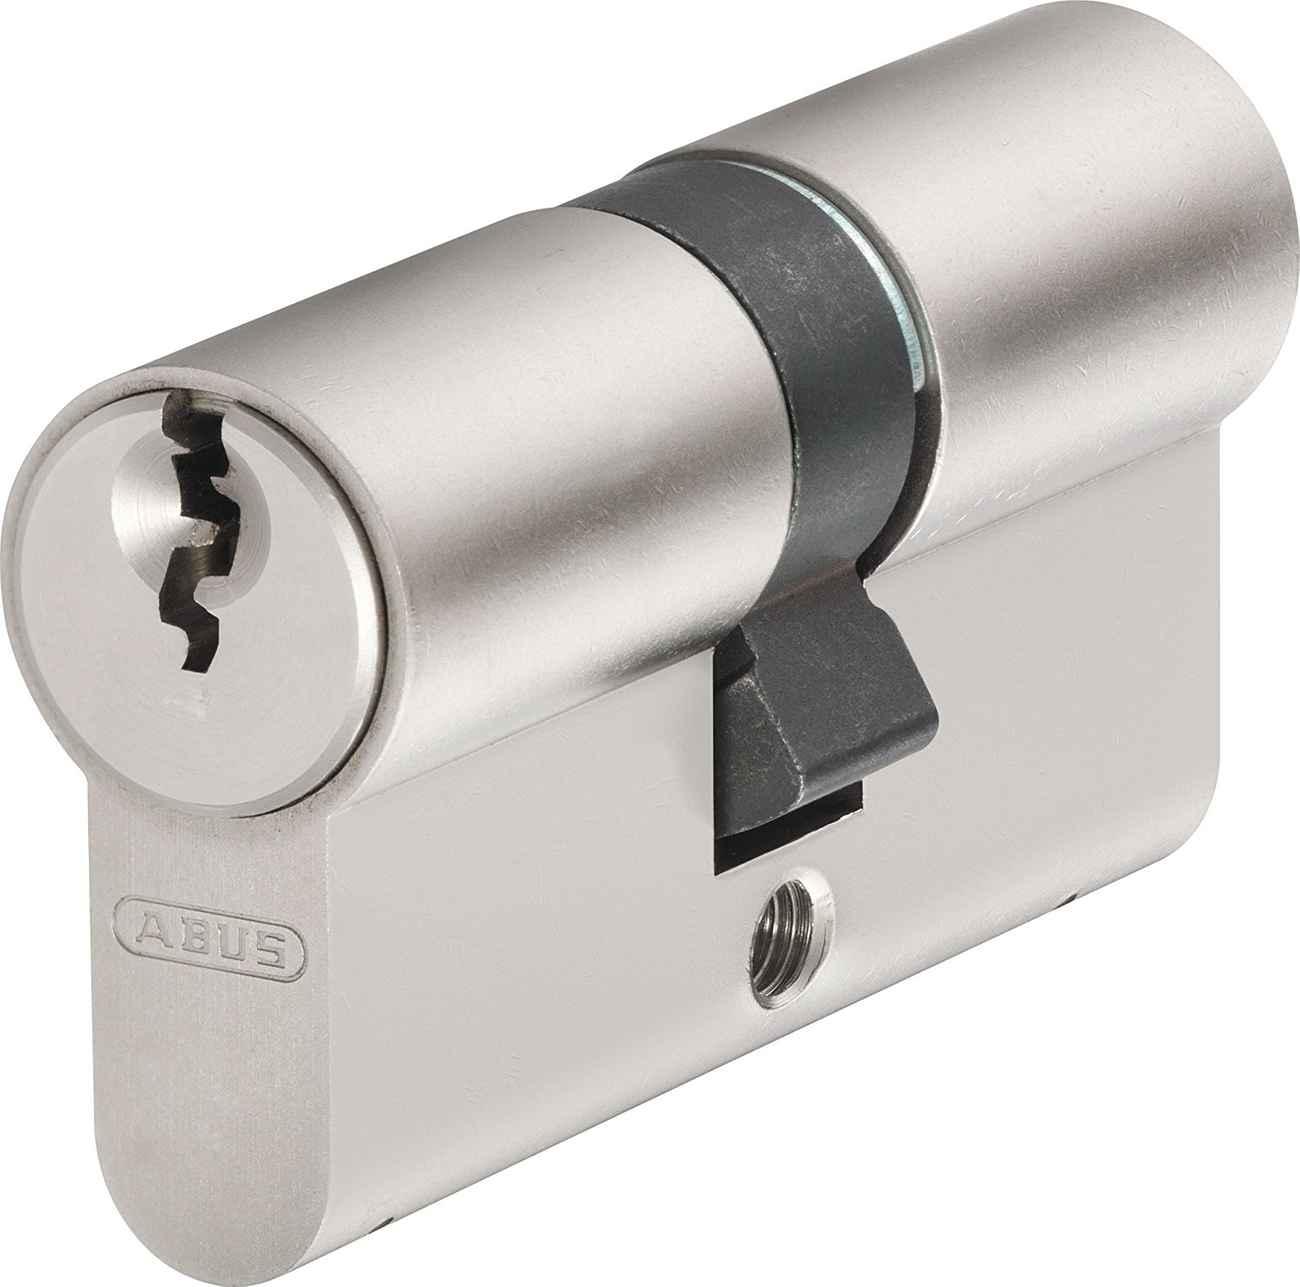 Abus Profilzylinder D6X 40/50 mm, 5 Schlüssel, Codekarte